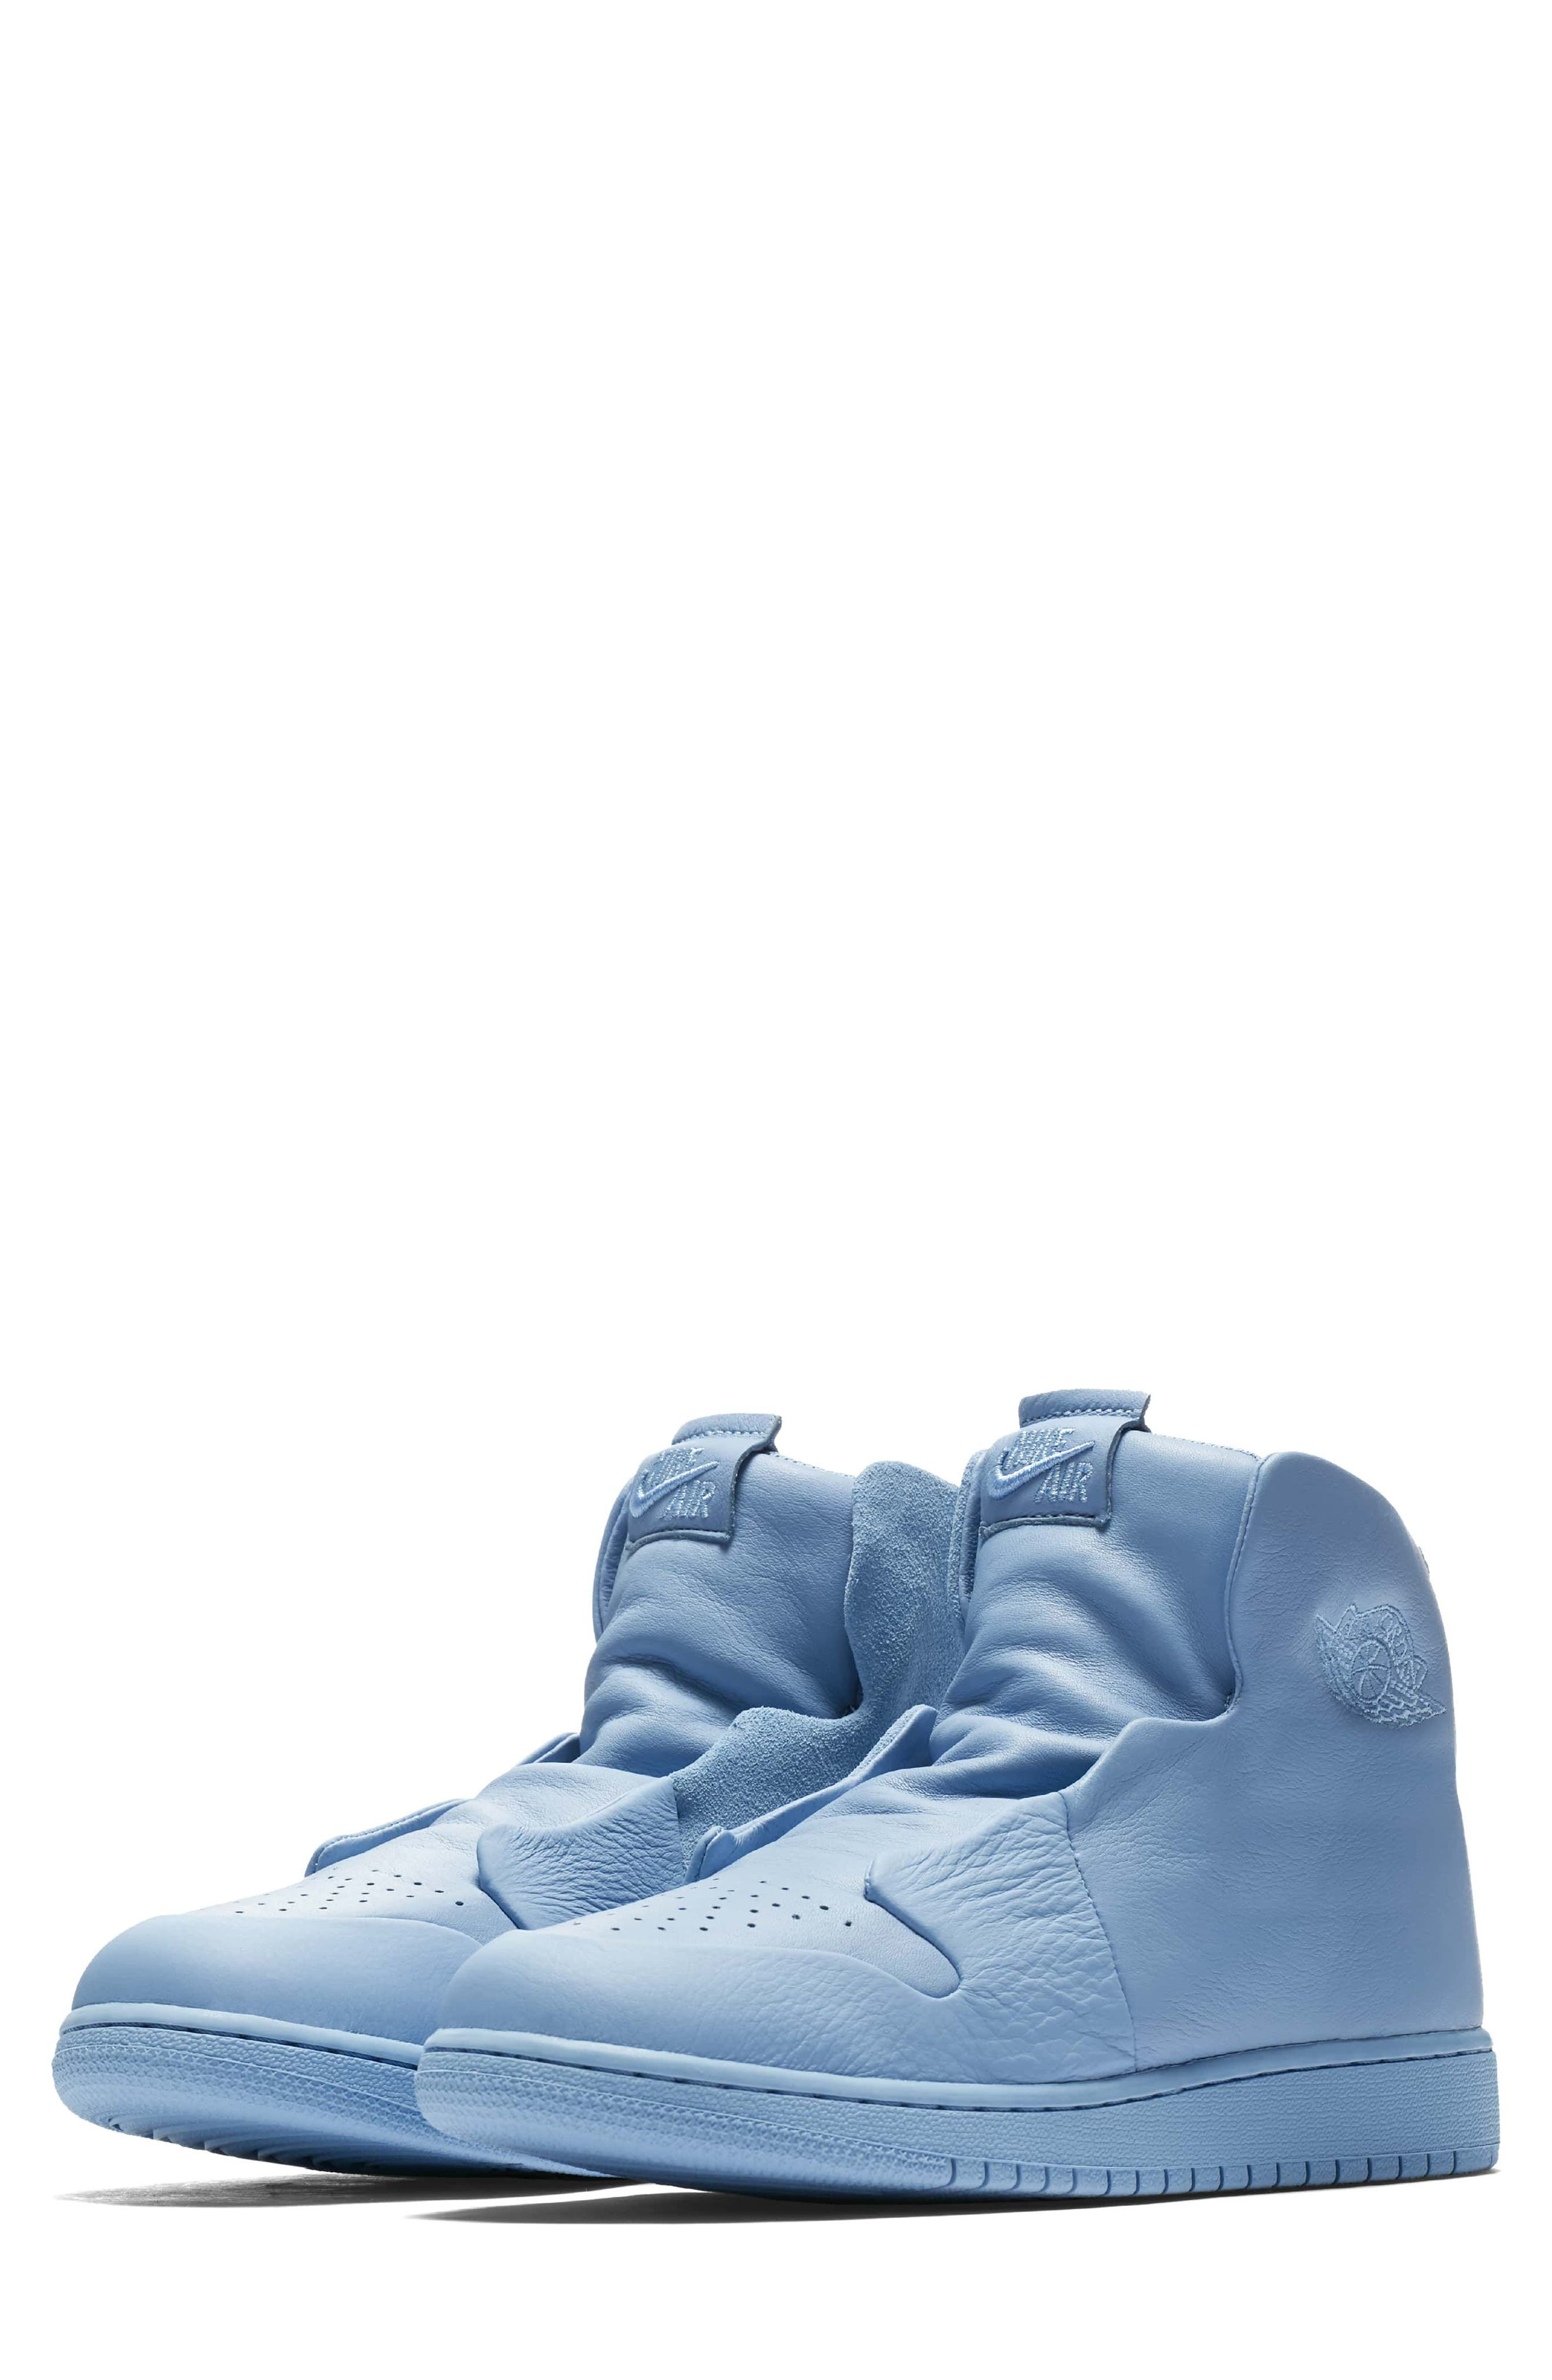 Nike Air Jordan 1 Sage XX High Top Sneaker (Women)